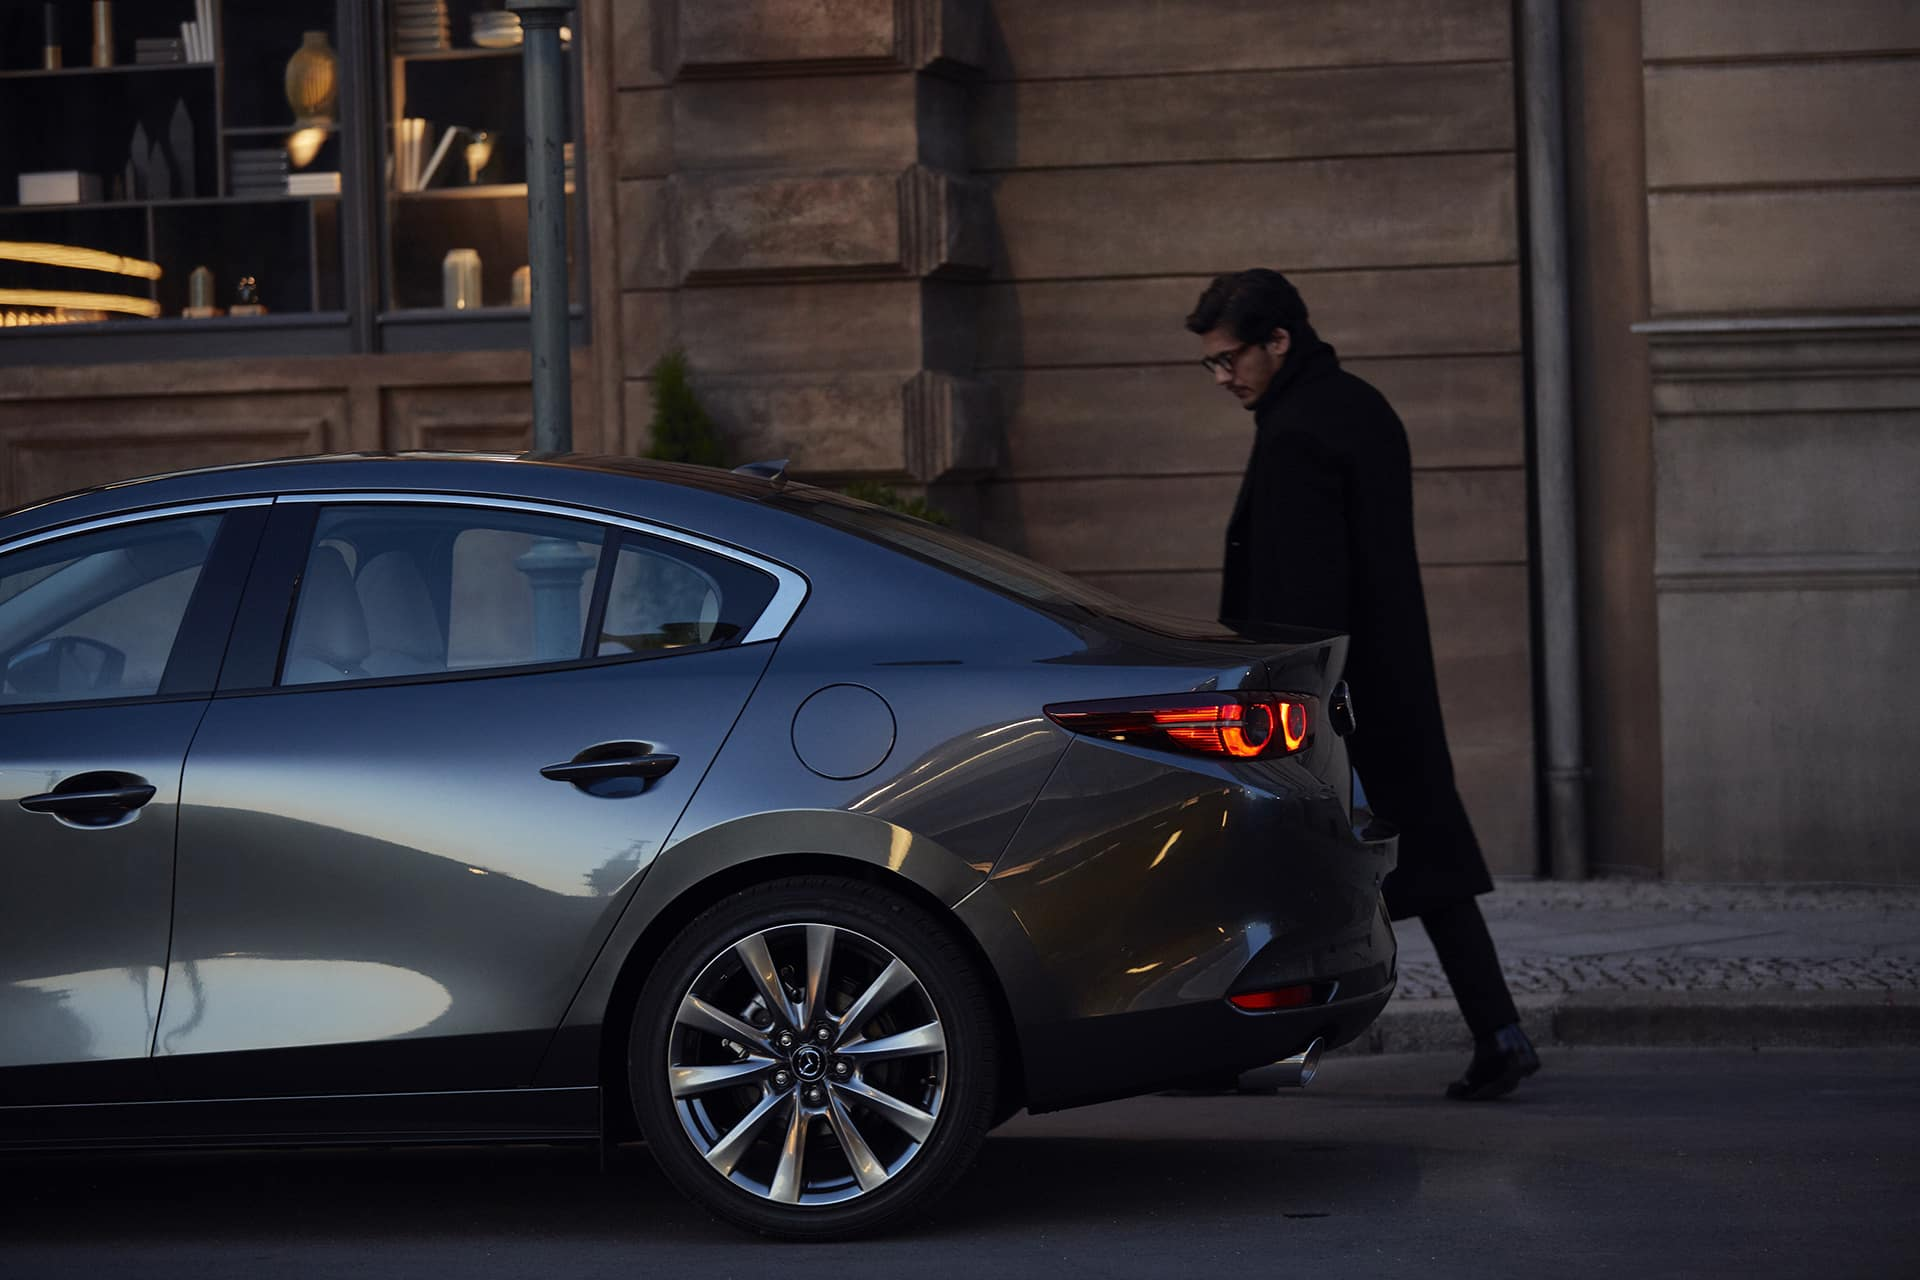 2020 Mazda3 Sedan Exterior Image Wheel